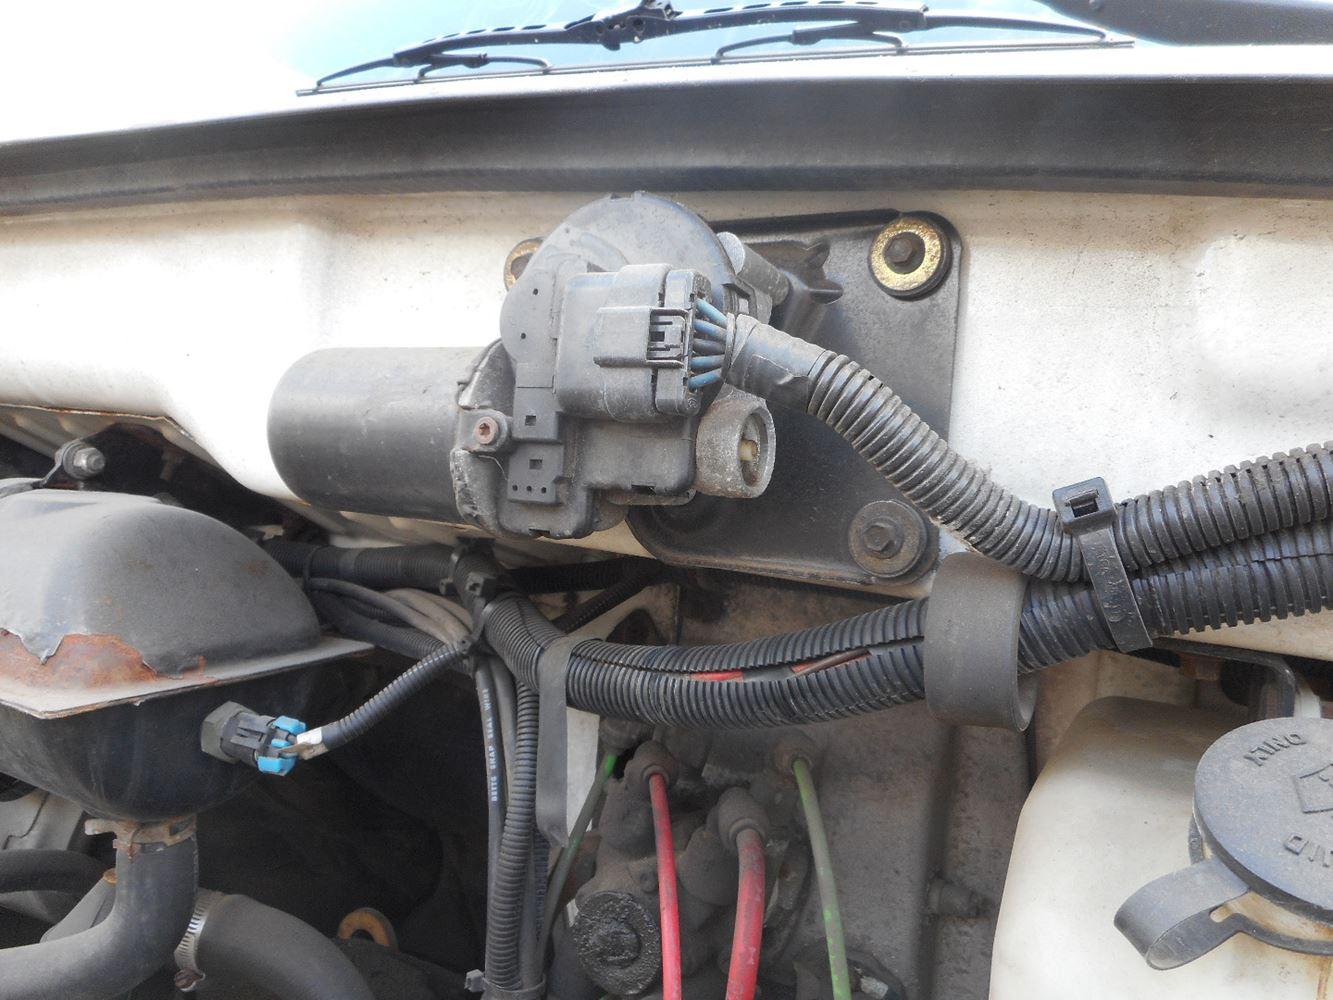 1987 chevy truck wiper motor wiring diagram sterling truck wiper motor wiring #3